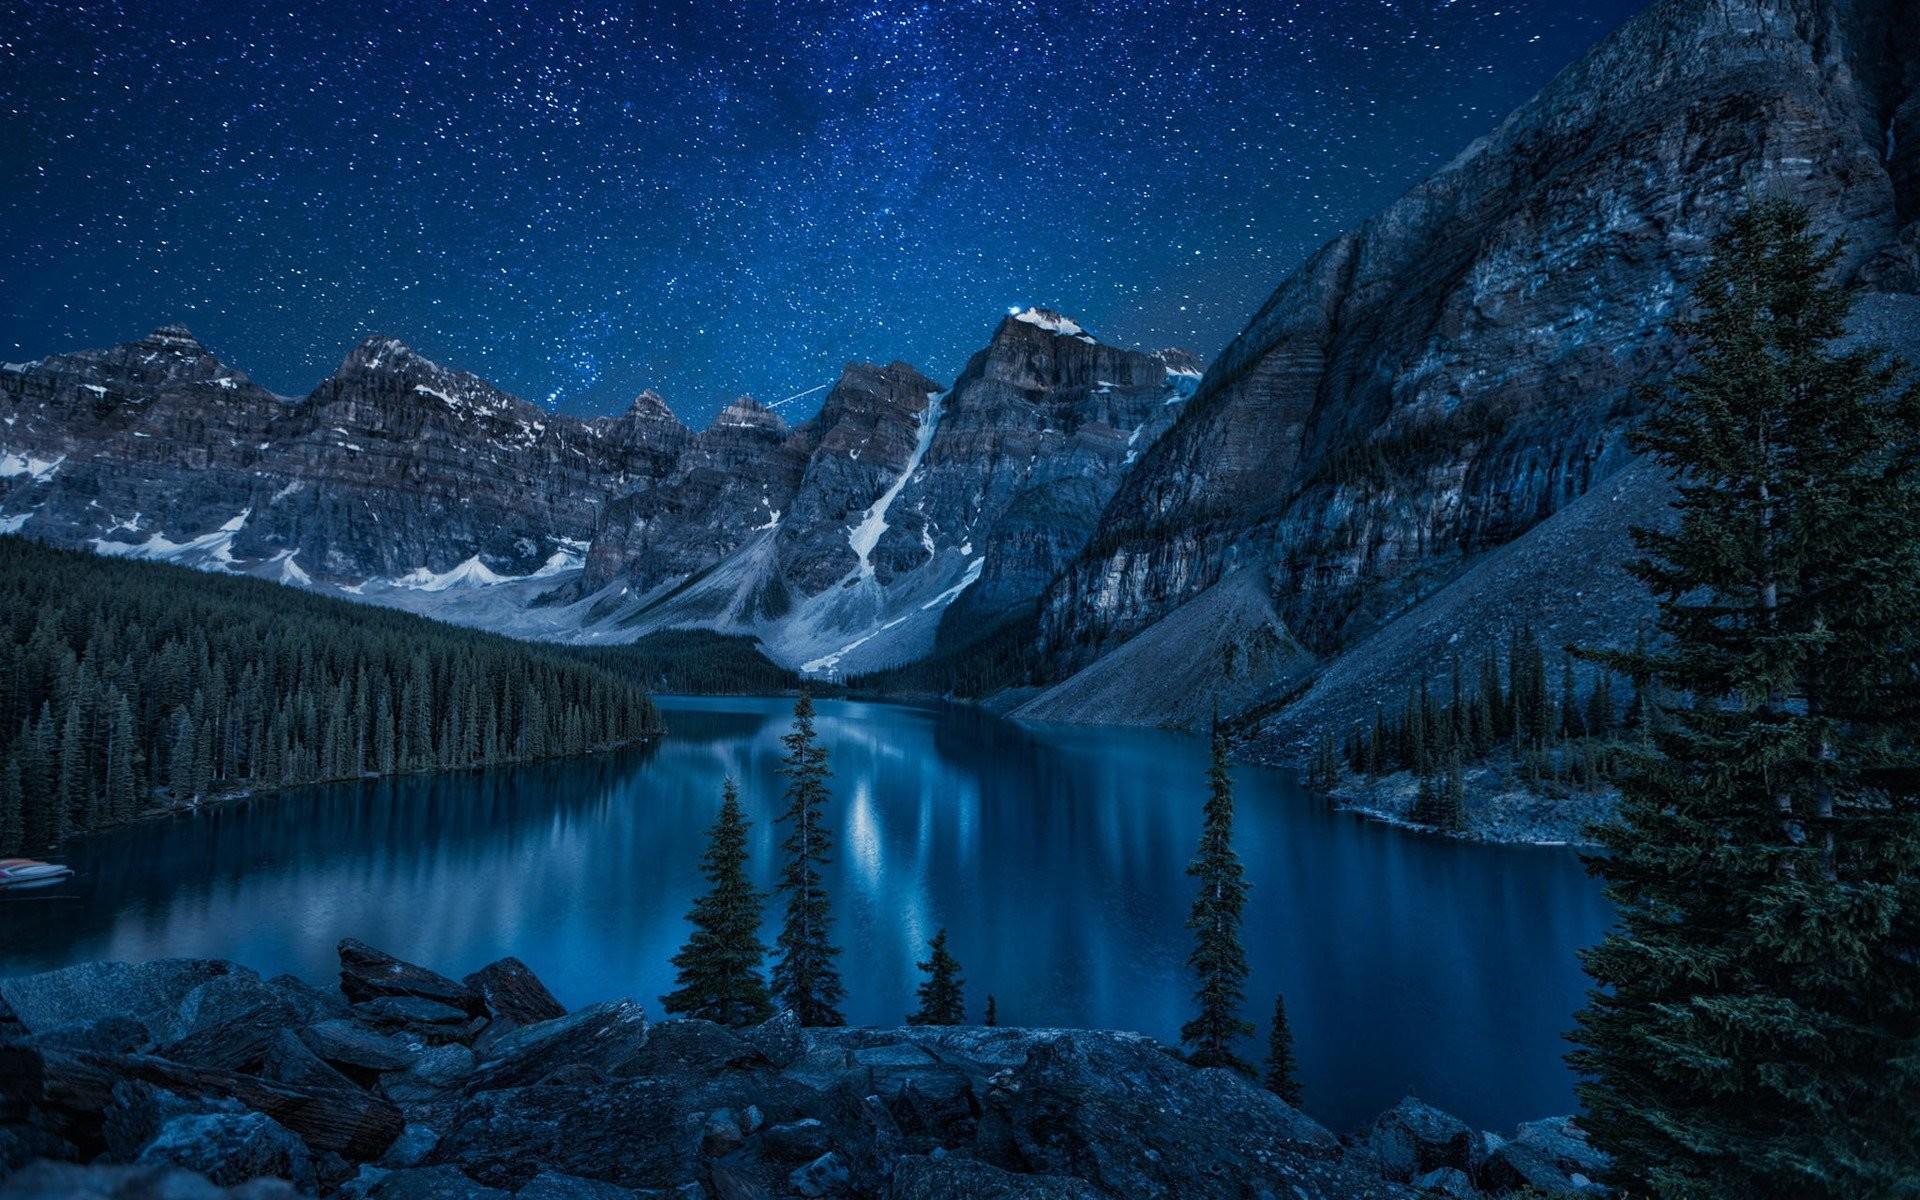 Mountains And Lake At Night